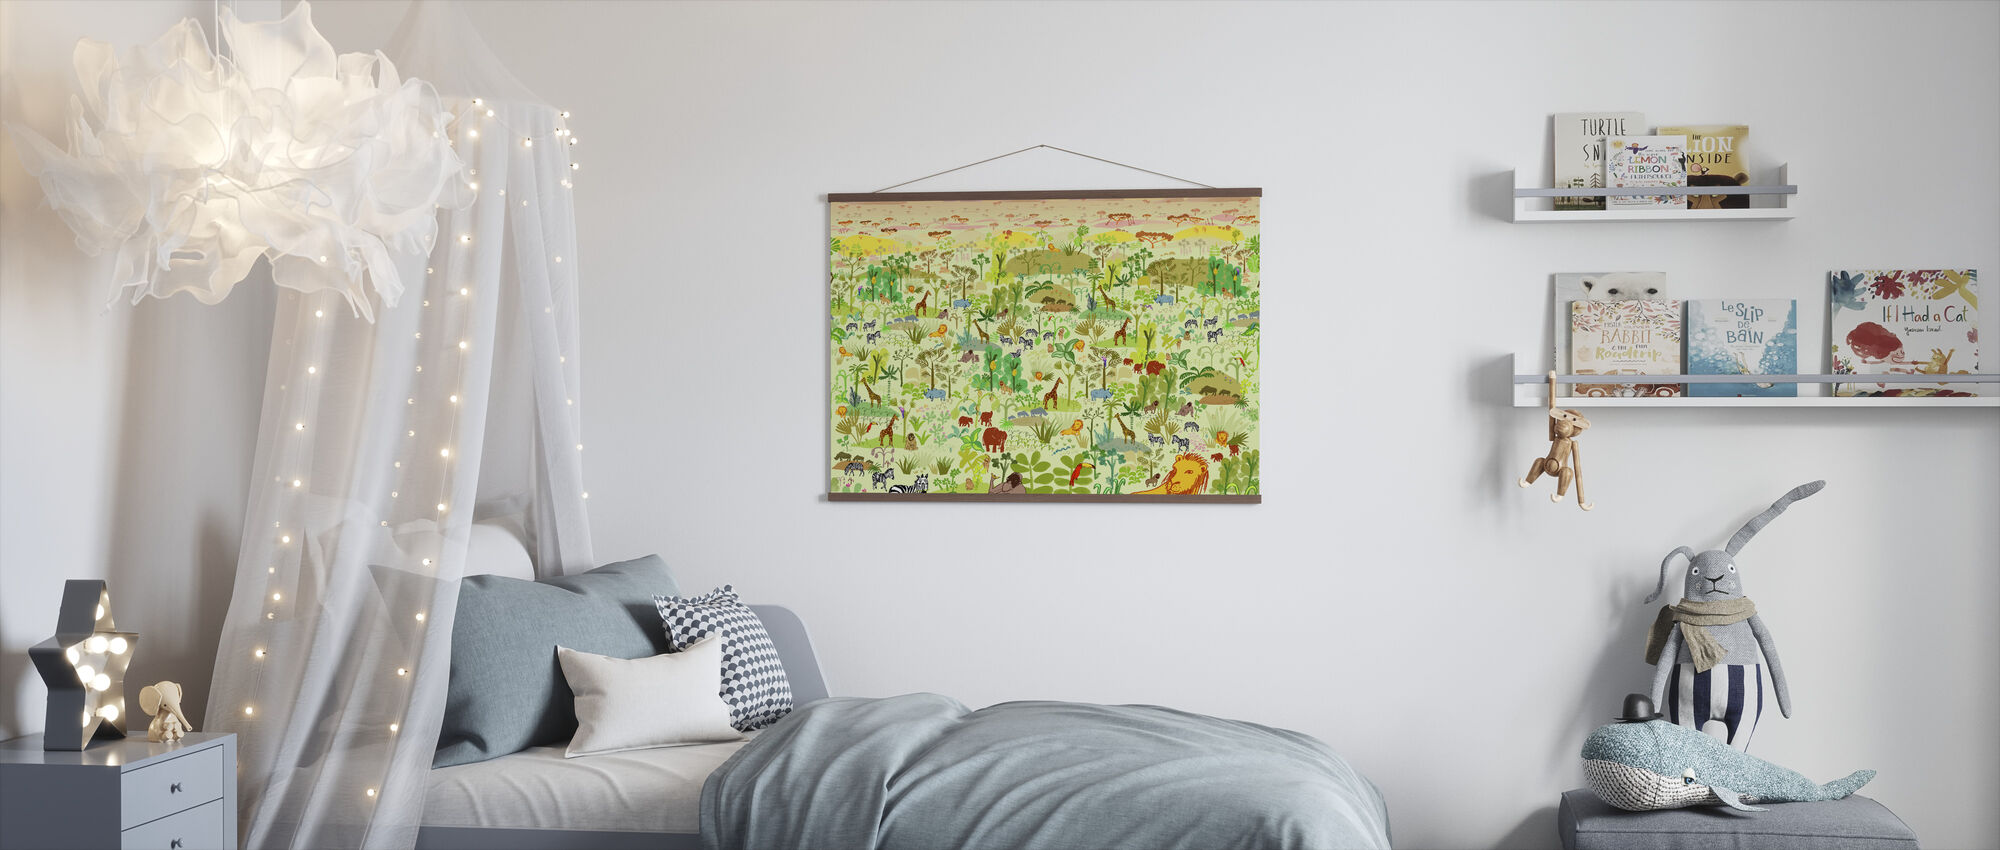 Serengeti - Poster - Kids Room